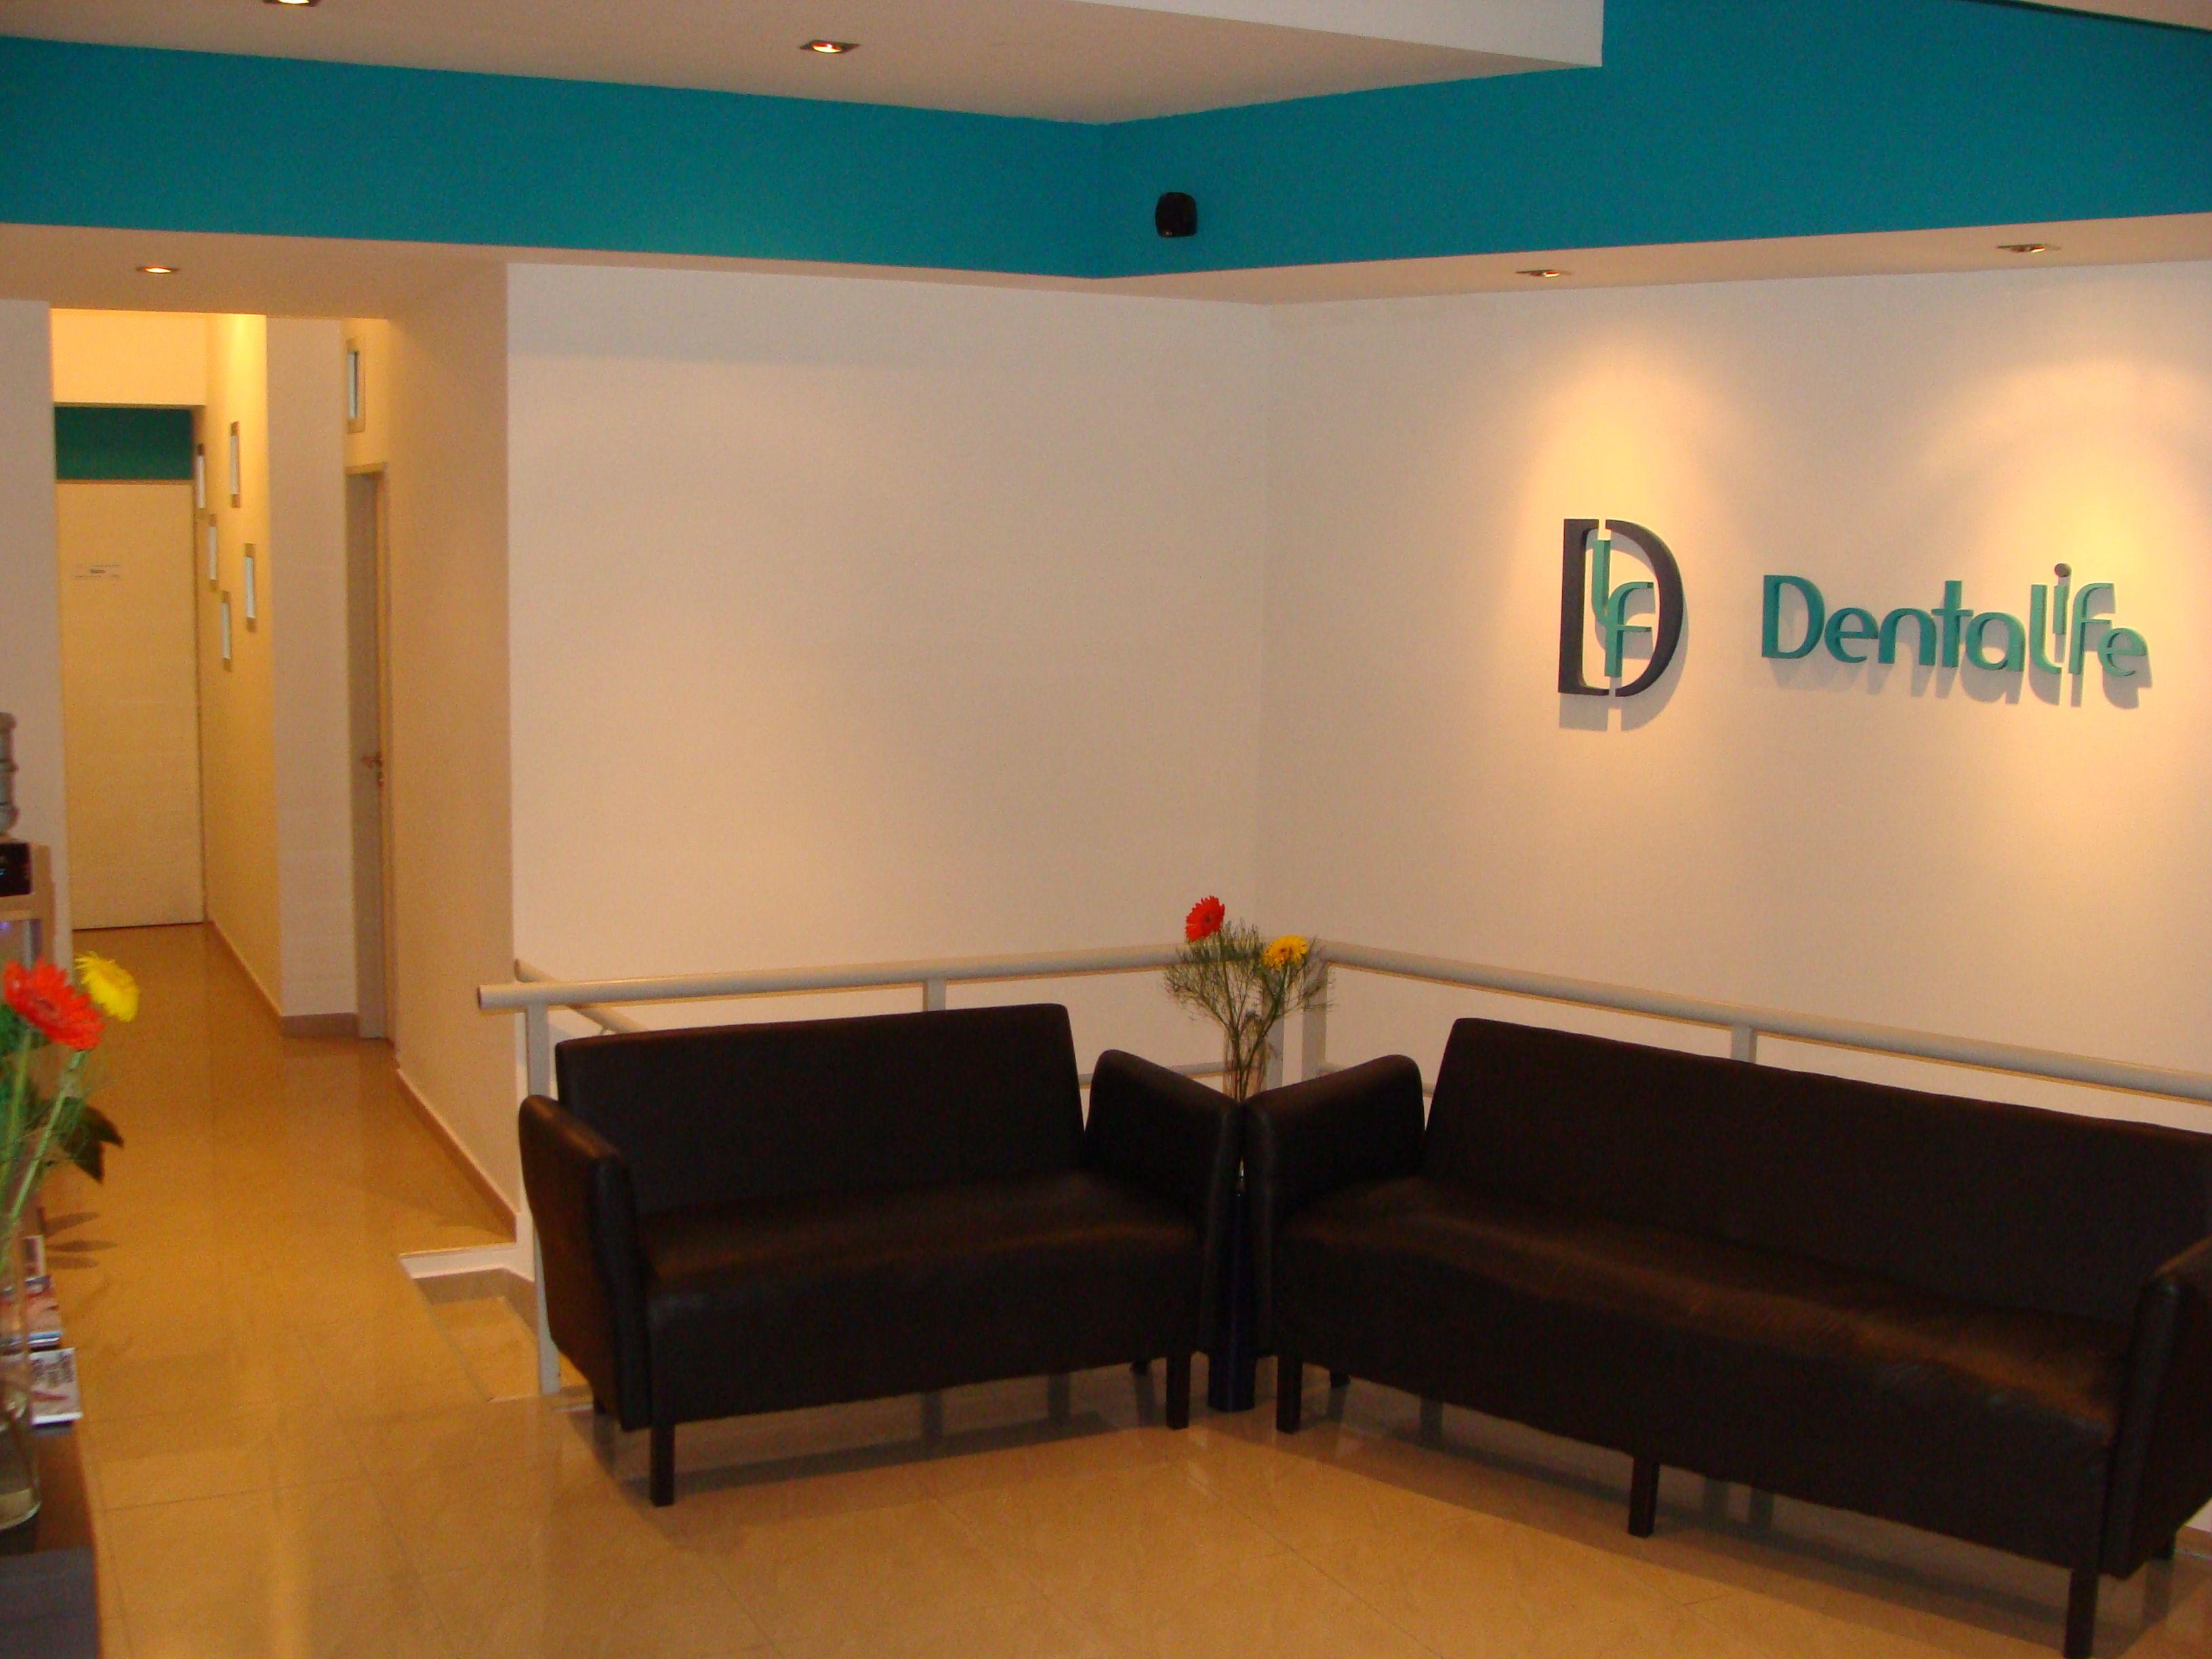 Sala de espera consultorio dentalife palermo soho pinterest salas de espera consultorio y - Muebles para sala de espera ...